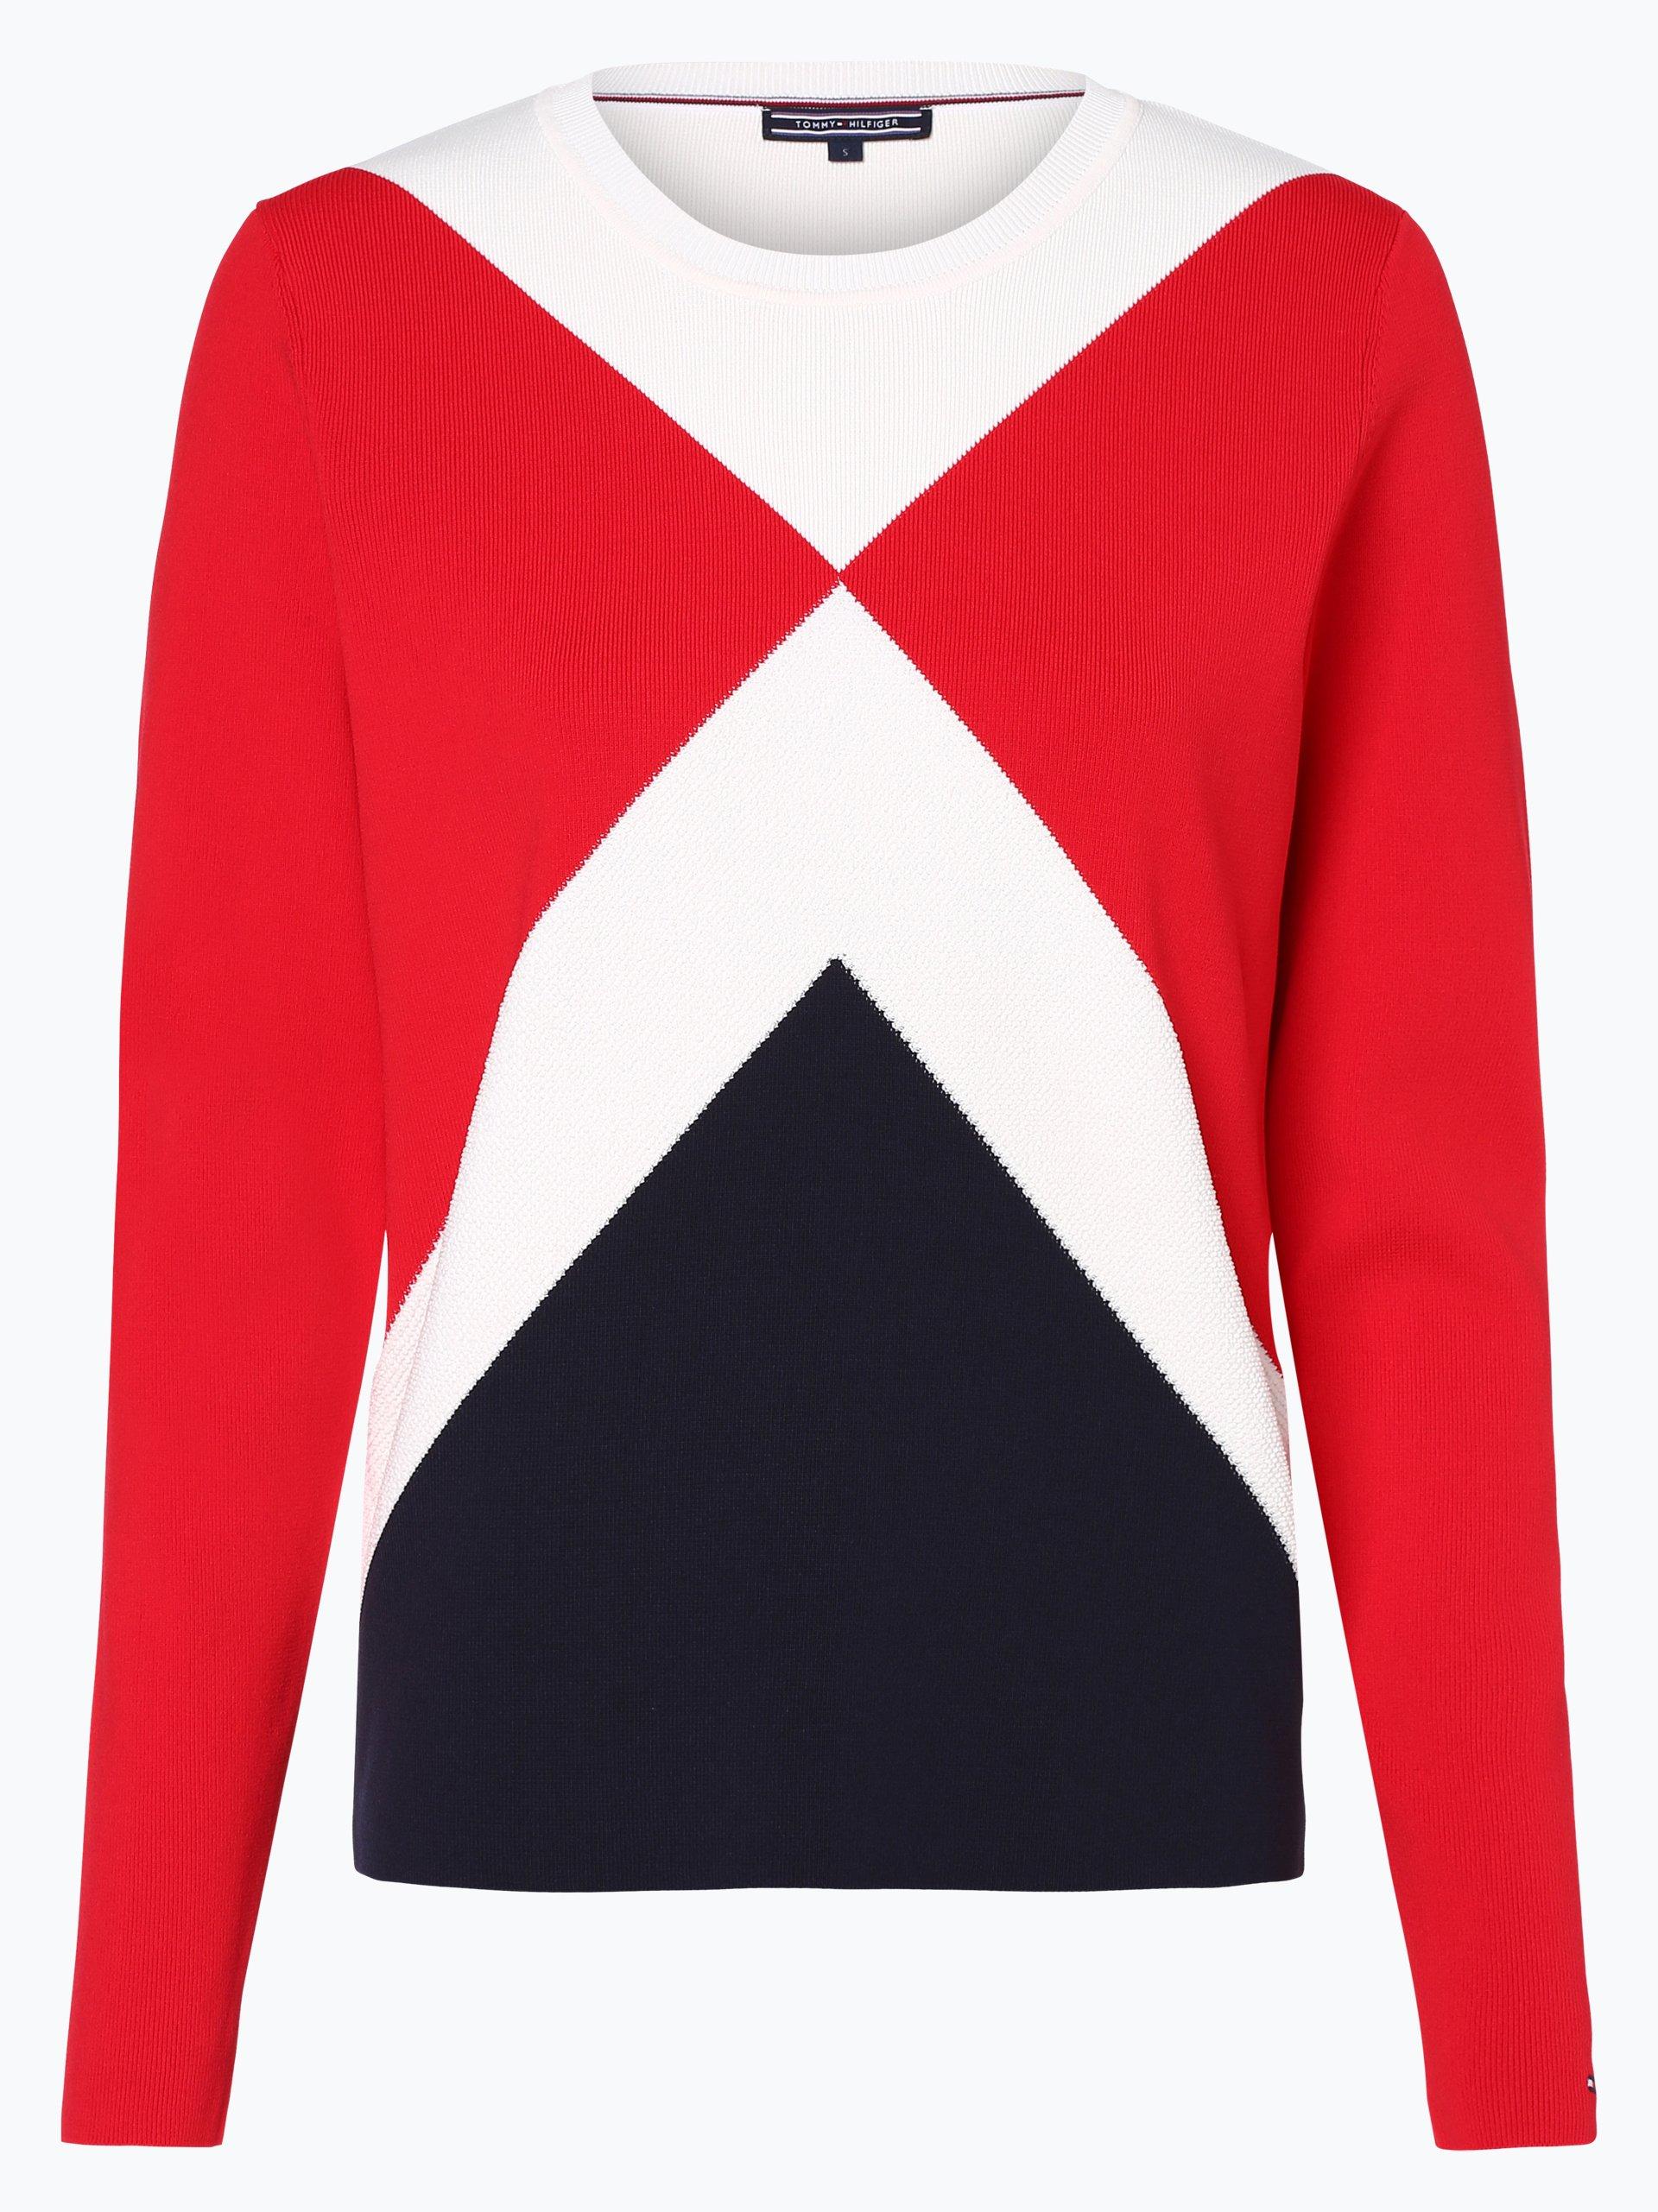 tommy hilfiger damen pullover rot gestreift online kaufen. Black Bedroom Furniture Sets. Home Design Ideas